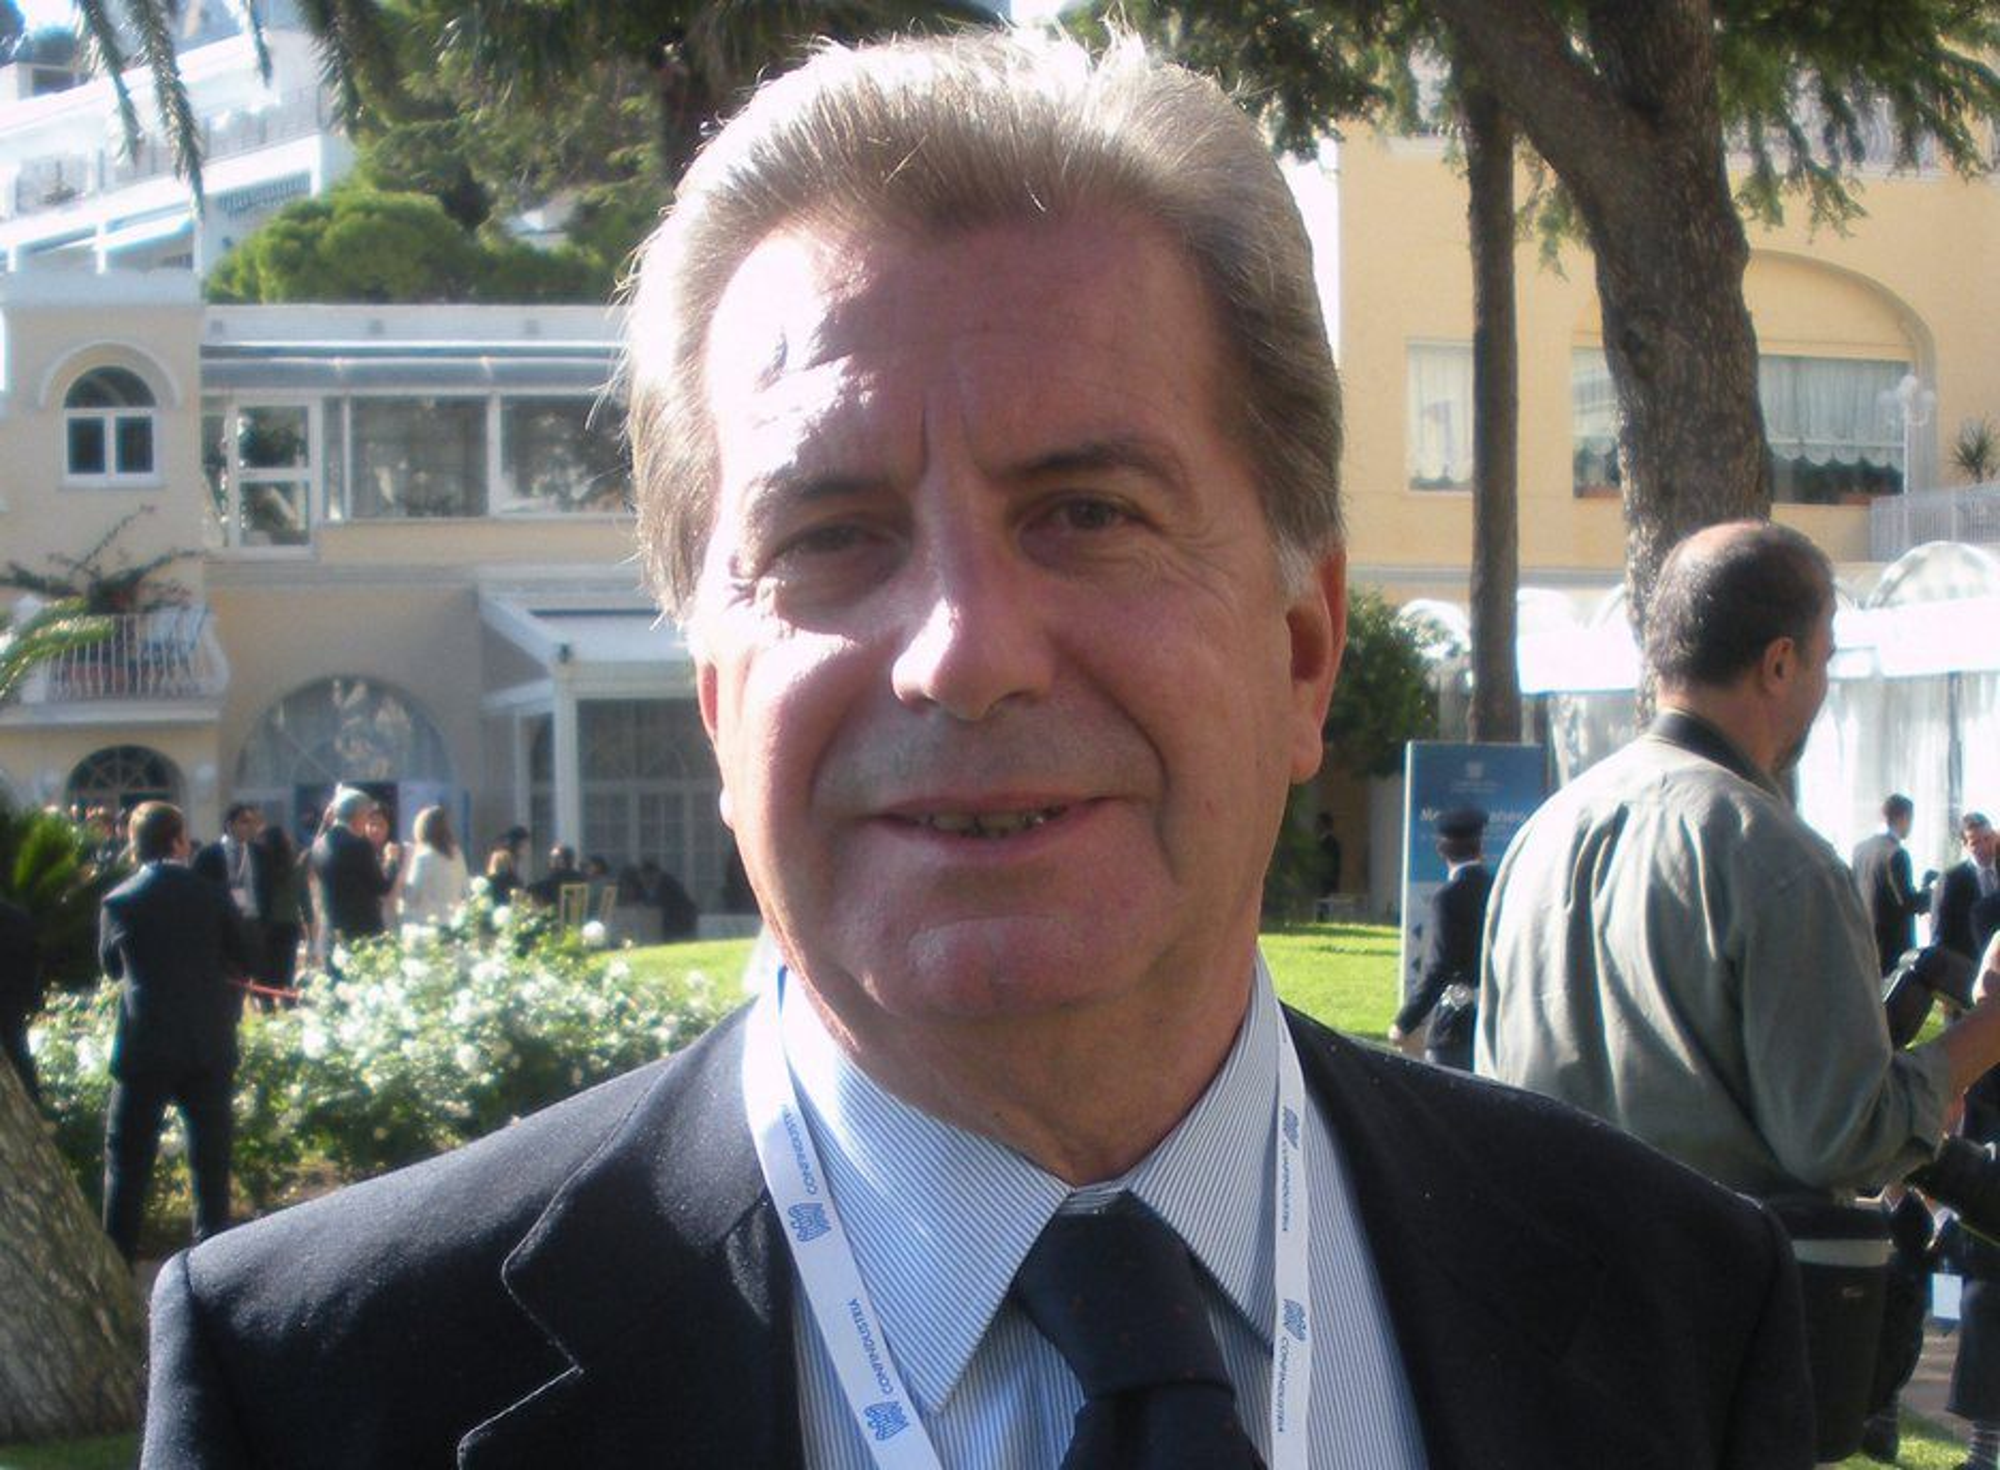 NYVALGT: Italienske Enels Fulvio Conti ble denne uken valgt til ny president i Eurelectric.